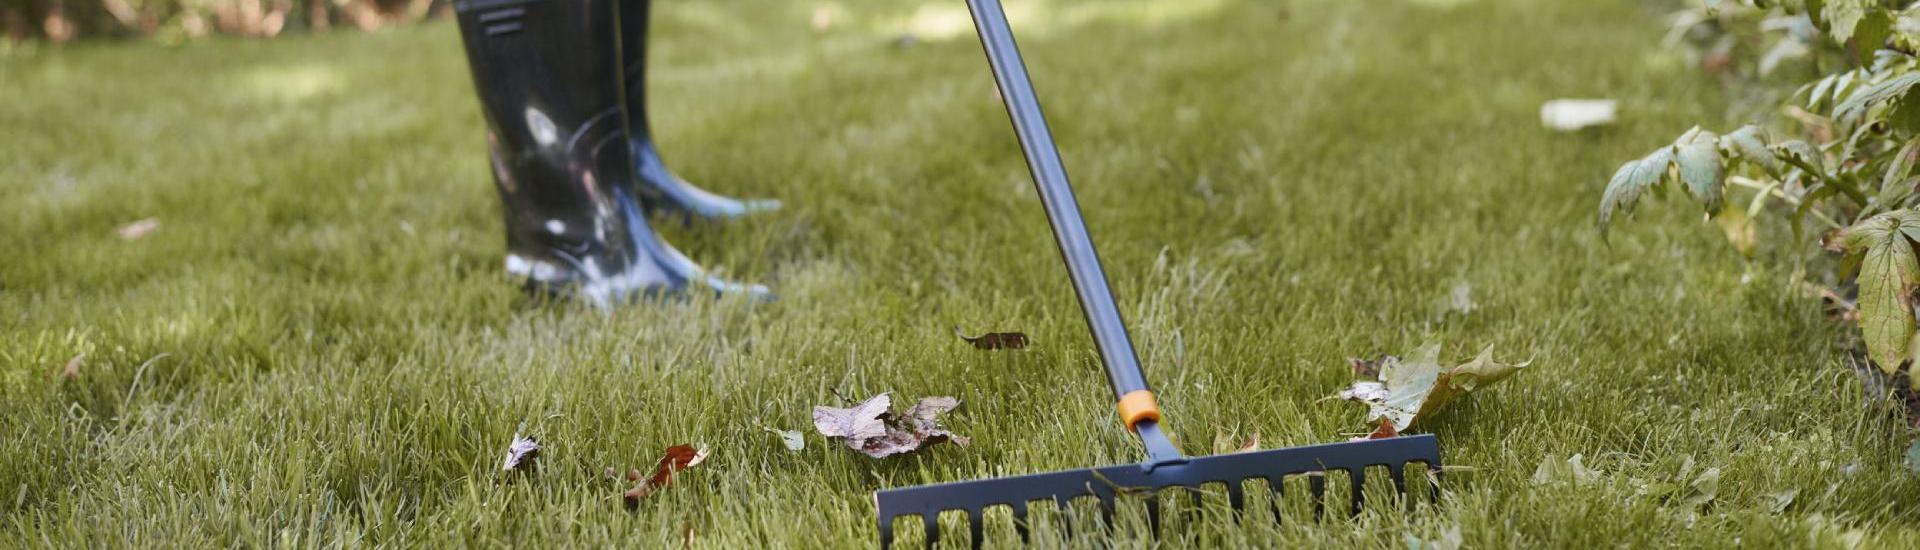 rateau jardinage